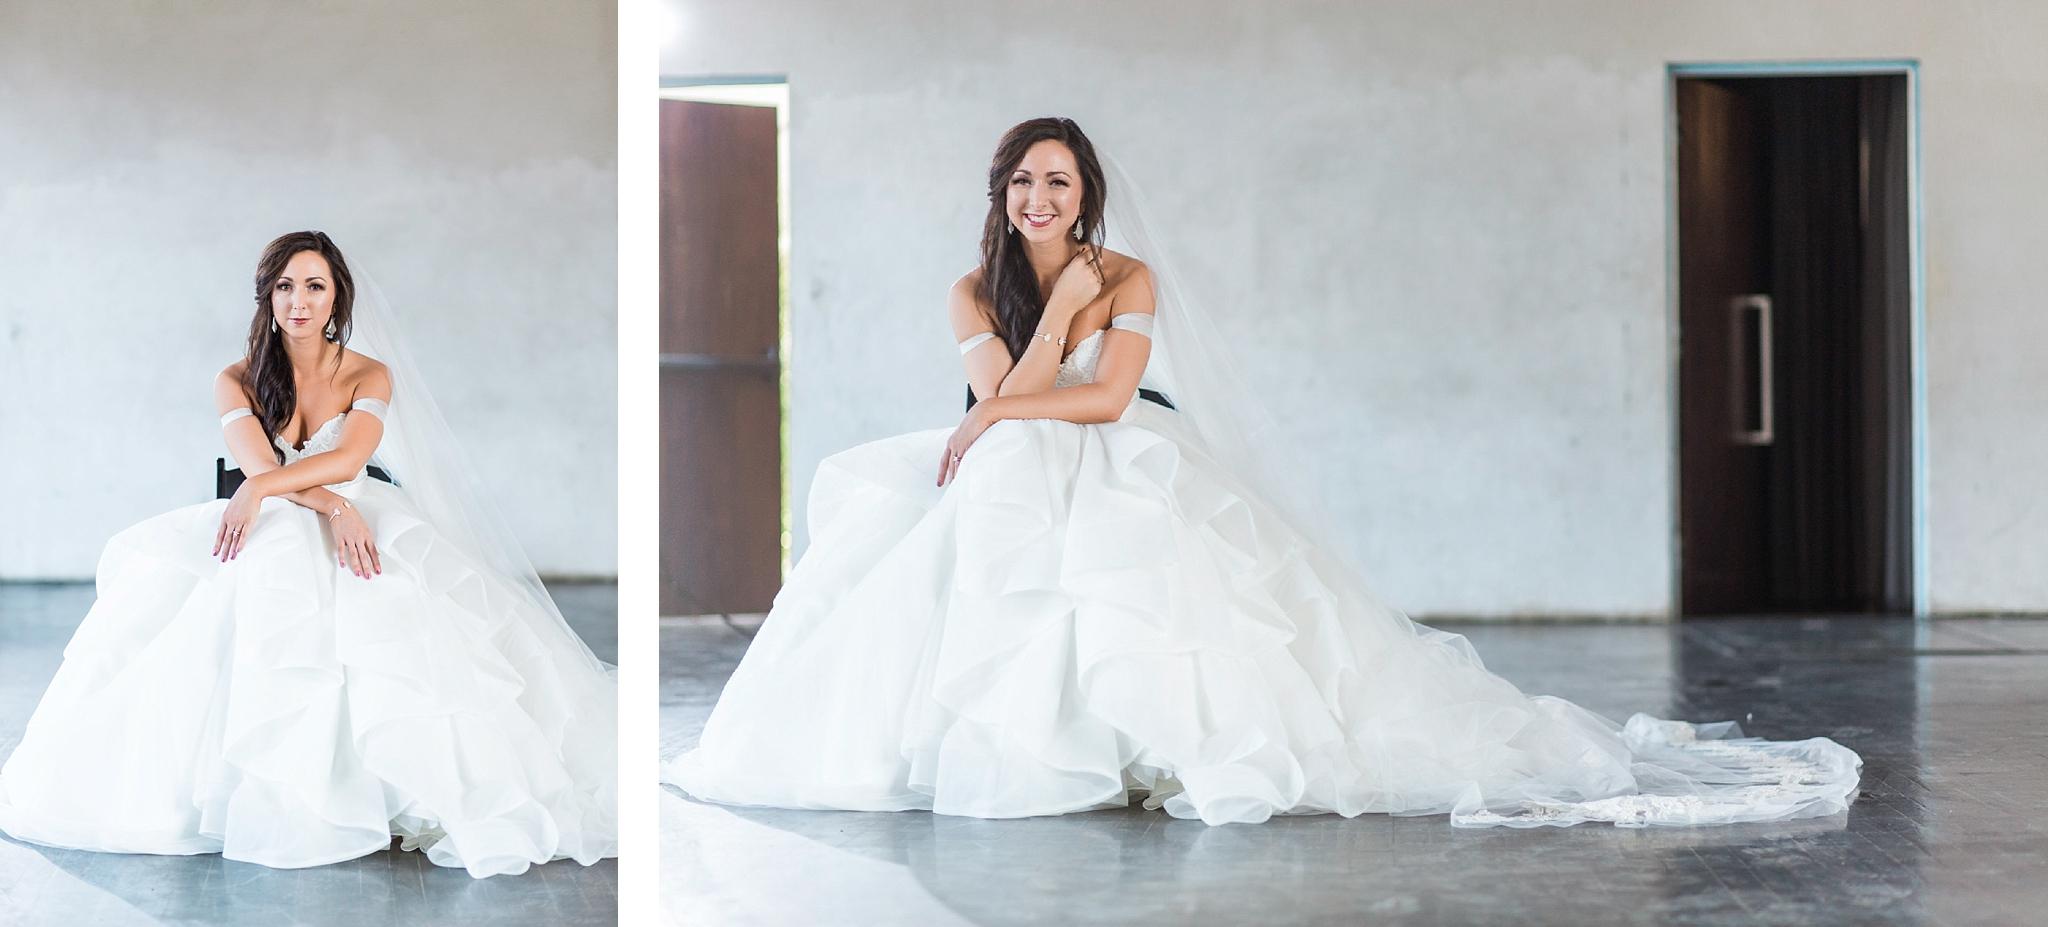 modern-nashville-wedding-venues.jpg